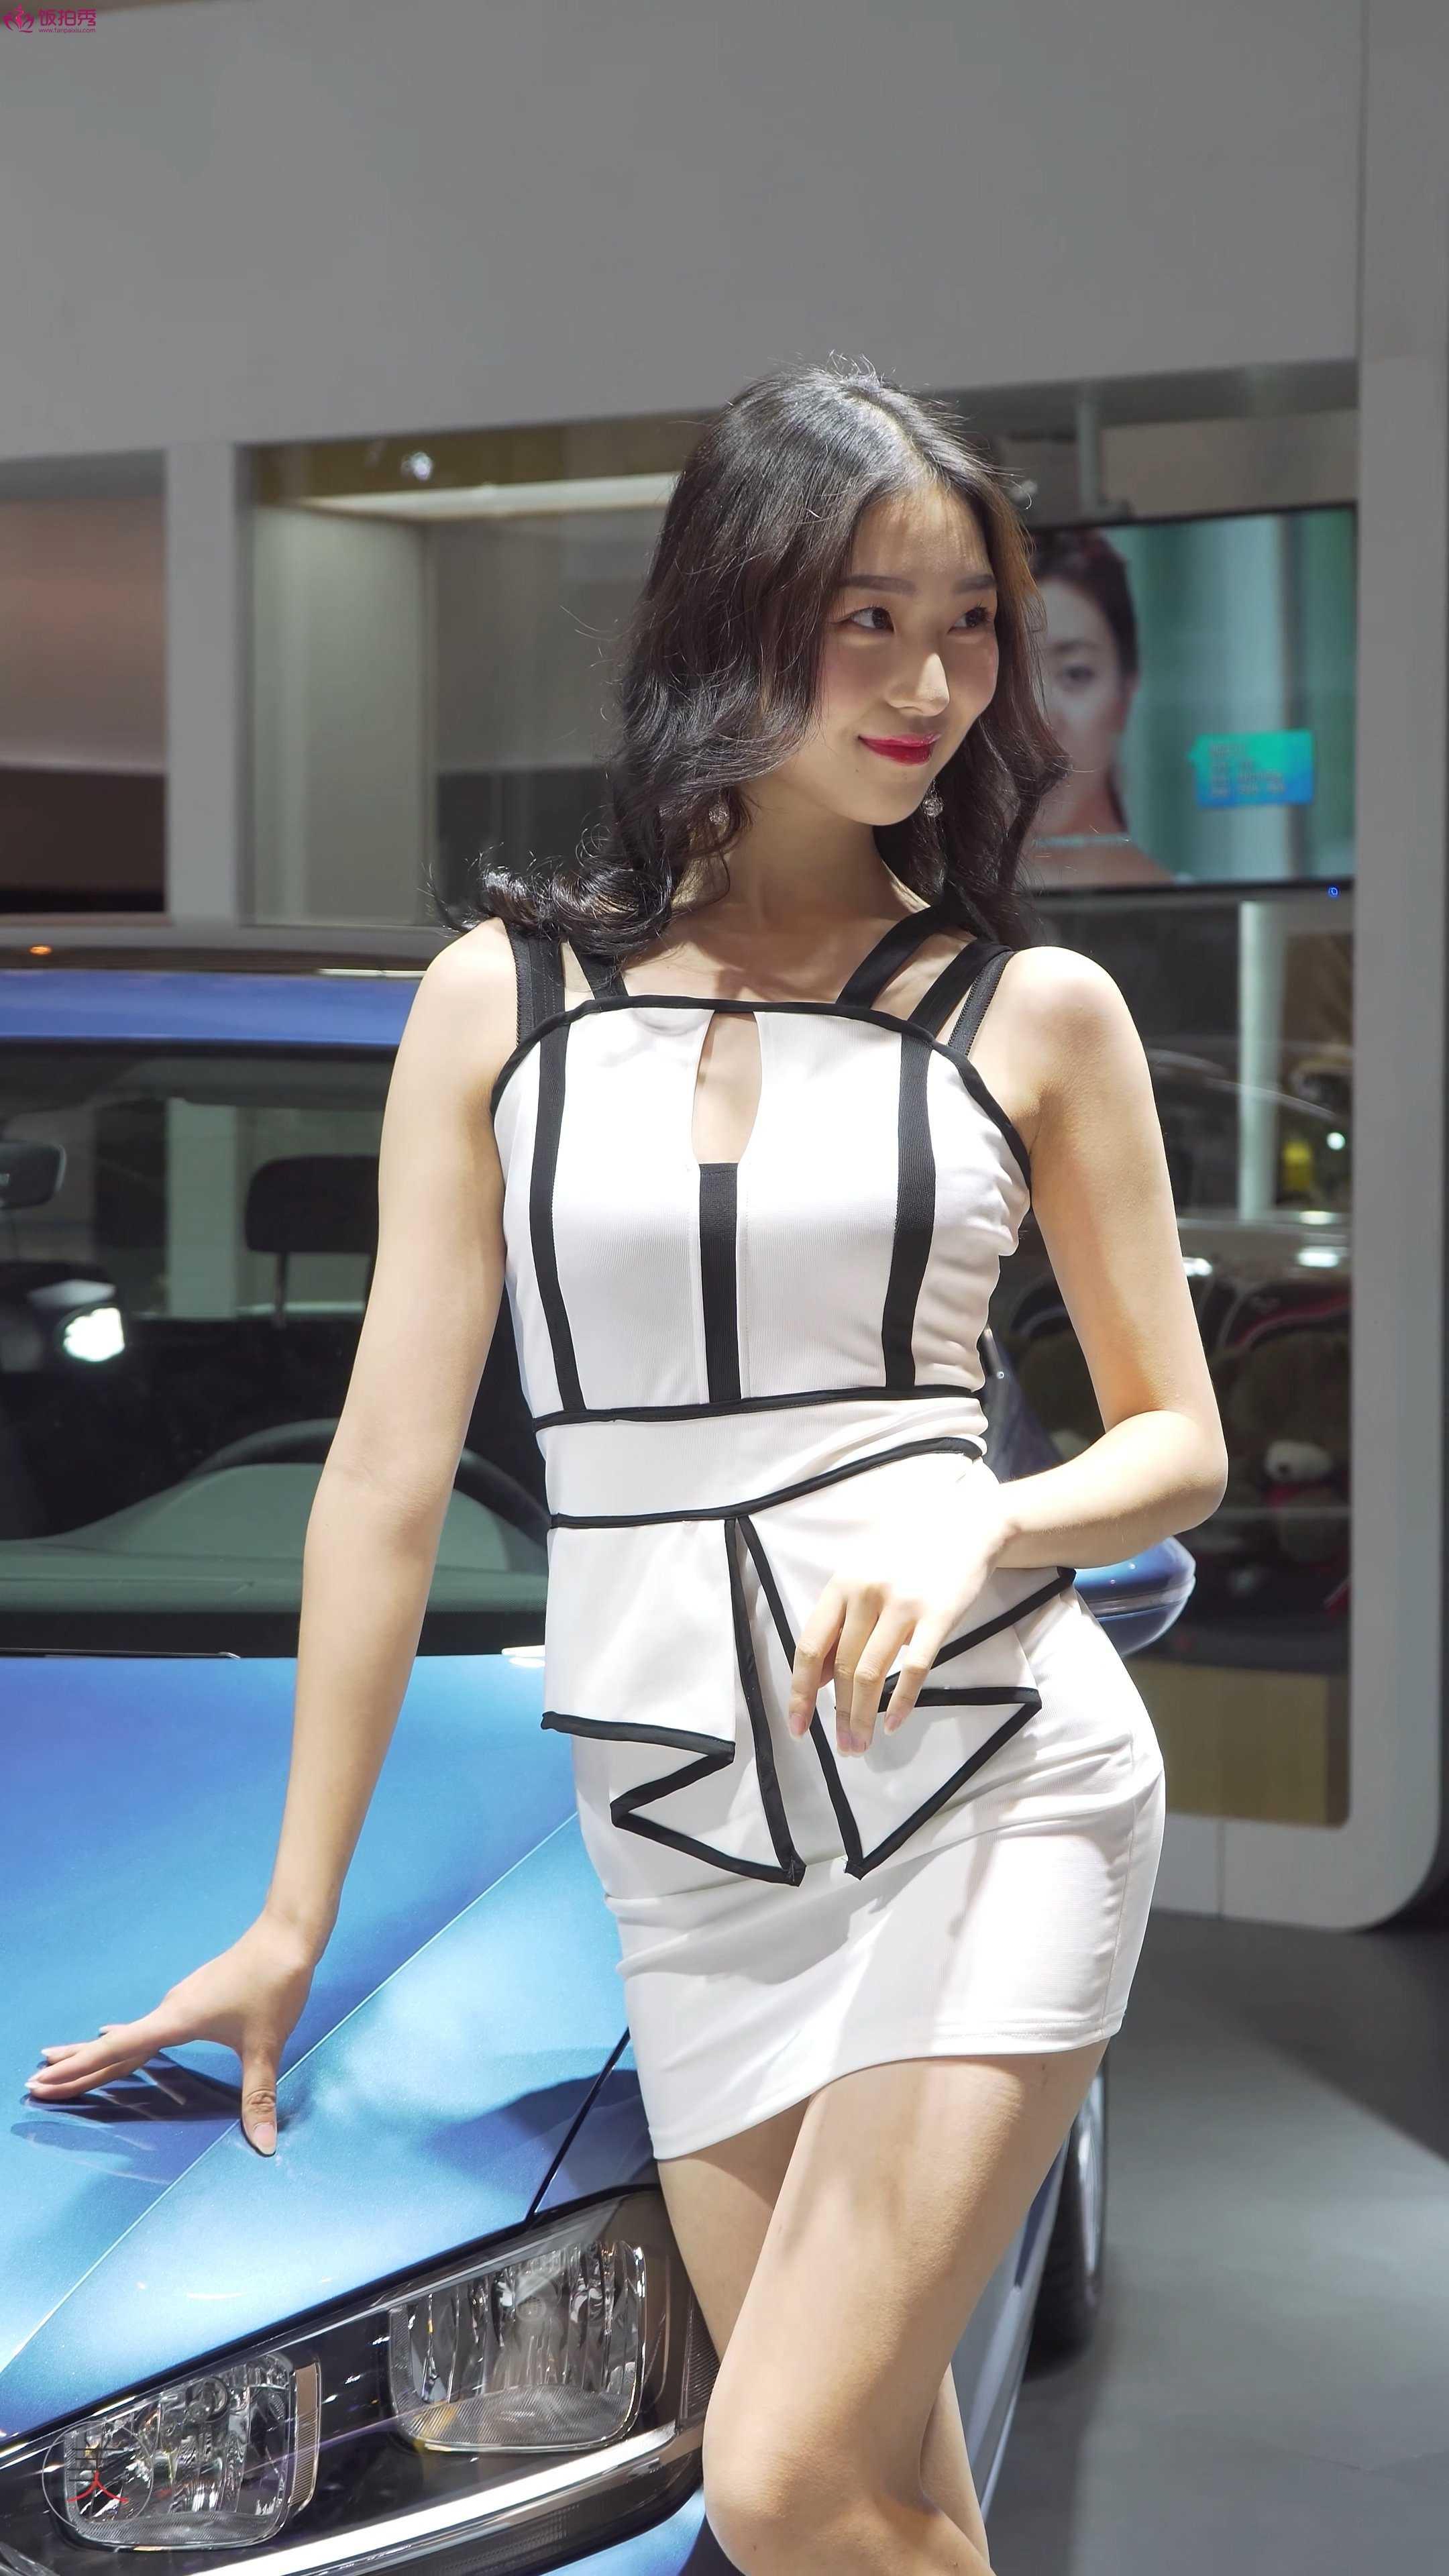 [8P][饭拍秀.2991-95][190310][2019上海Racing Model ShowGirl][蓝光4K]